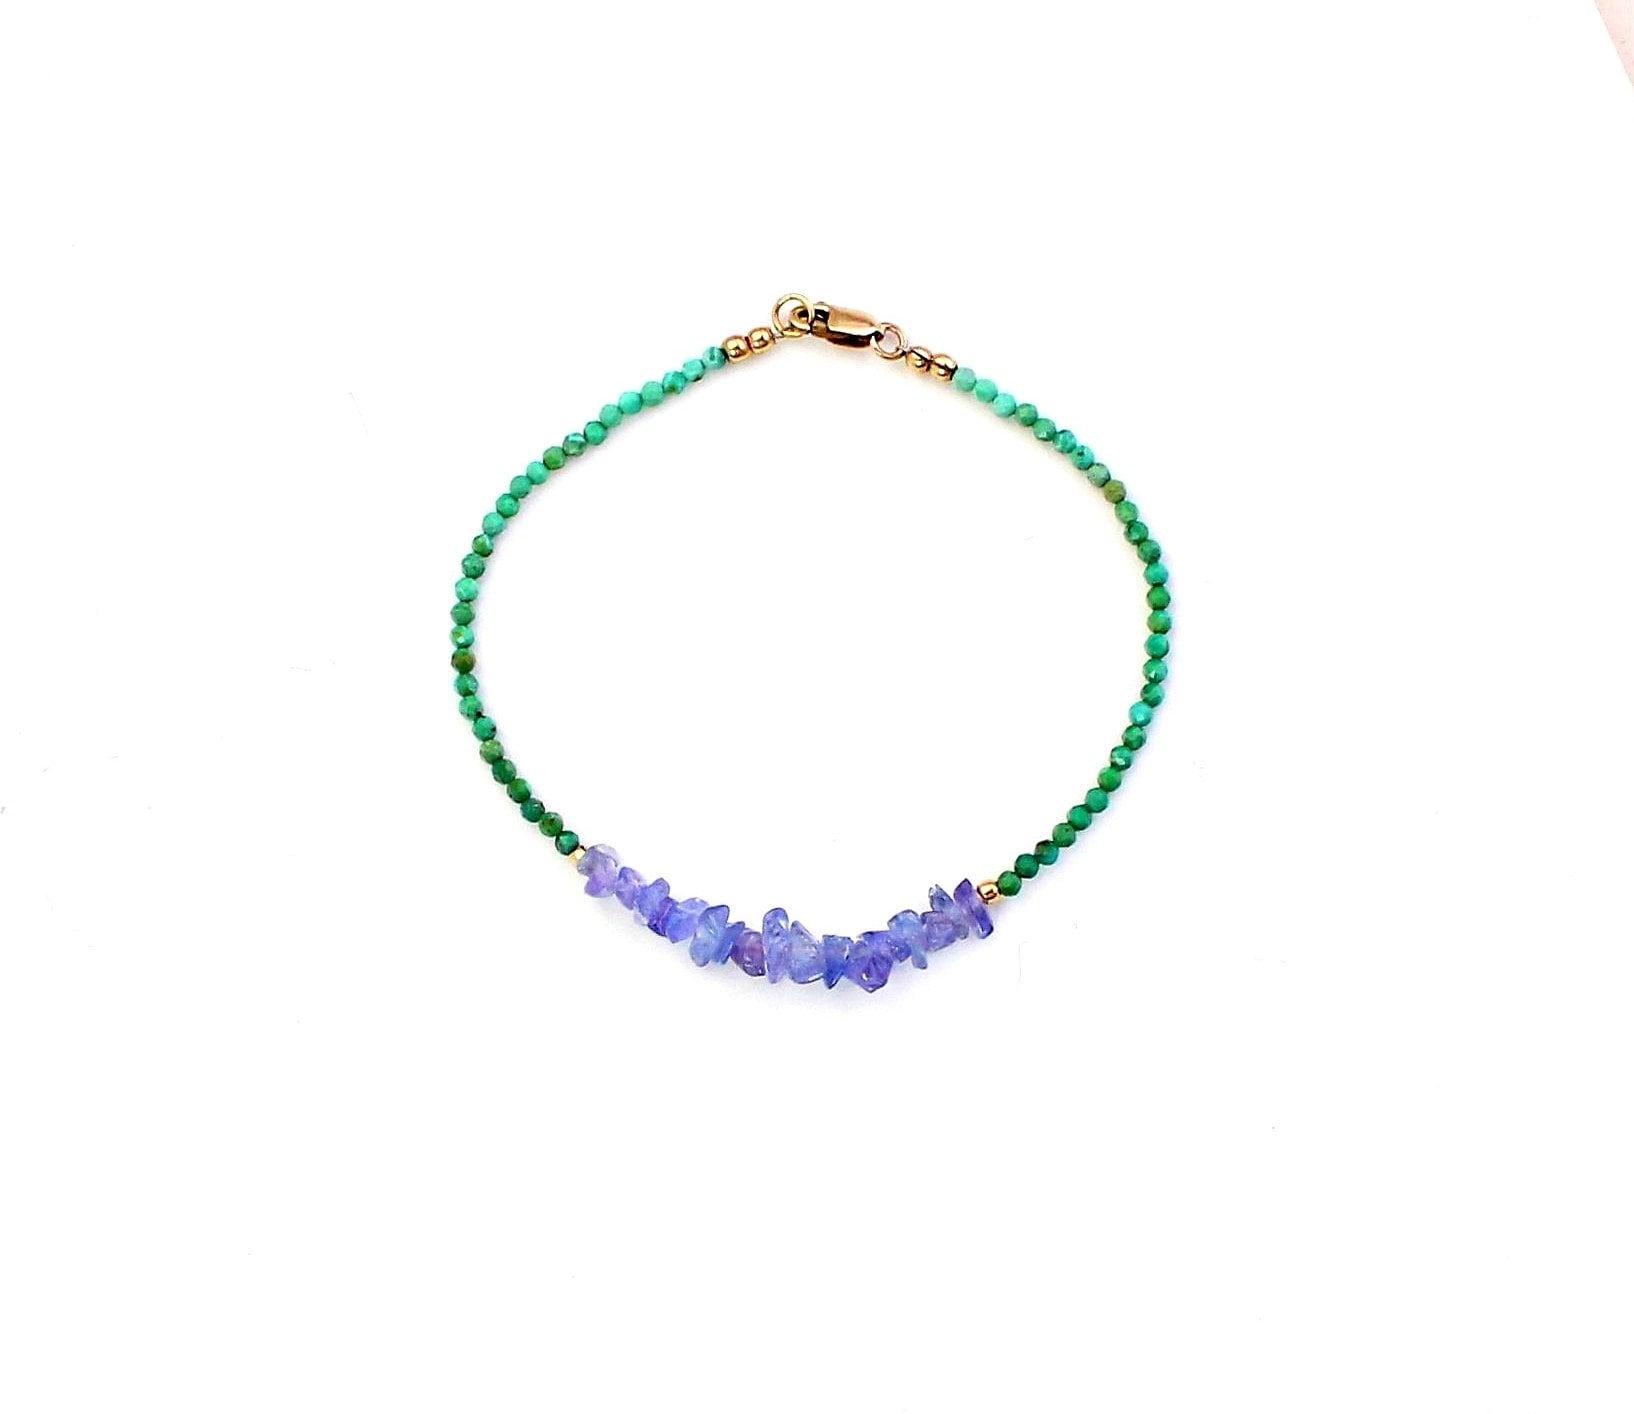 Gemstone Bracelet Stack Bracelet Turquoise Bracelet Boho Bracelet Gift For Her Bracelet For Women December Birthstone Bead Bracelet